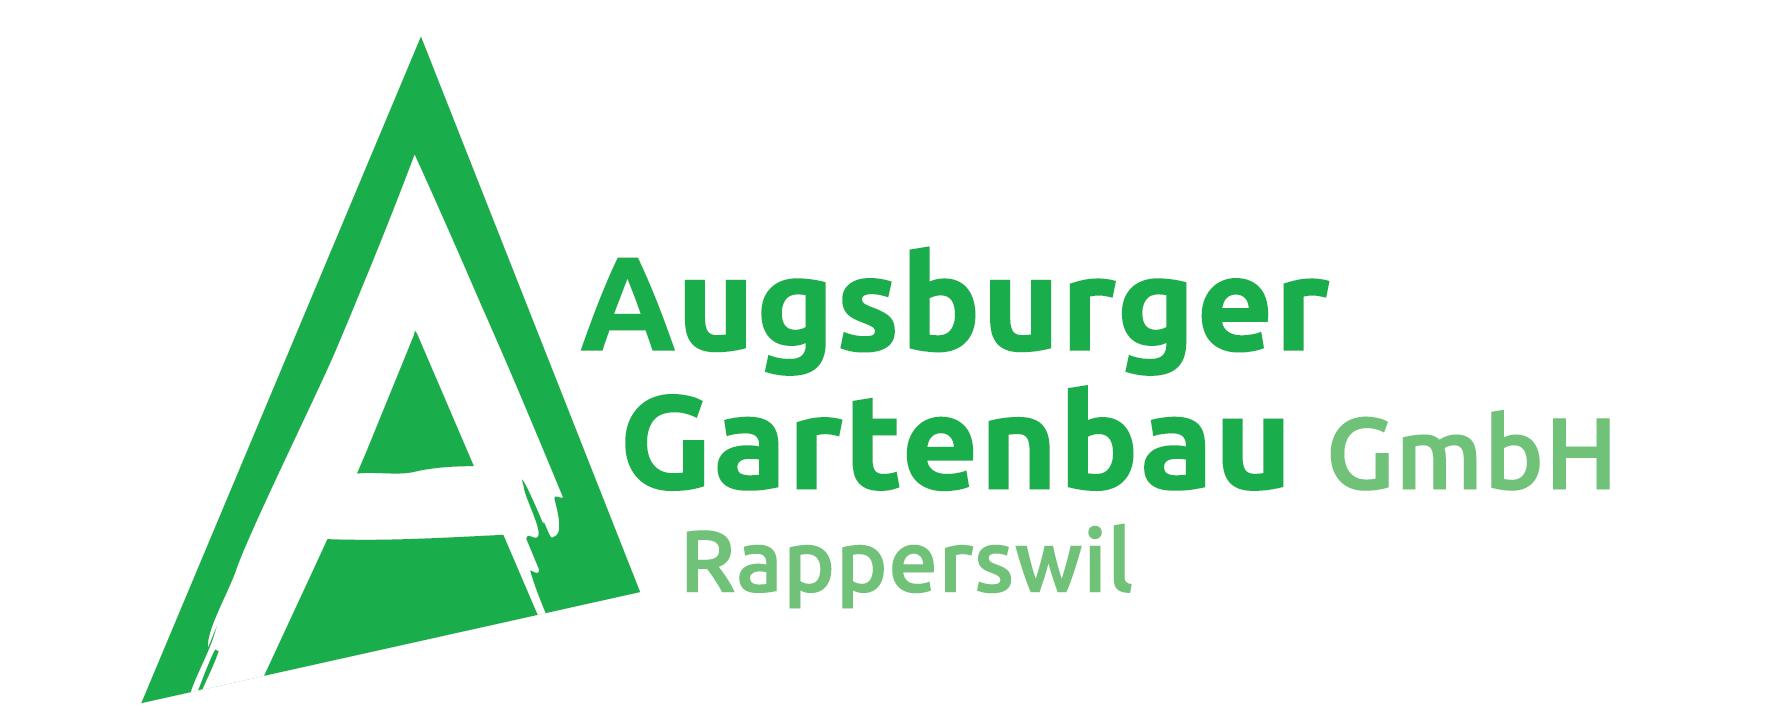 Augsburger Gartenbau GmbH, Rapperswil